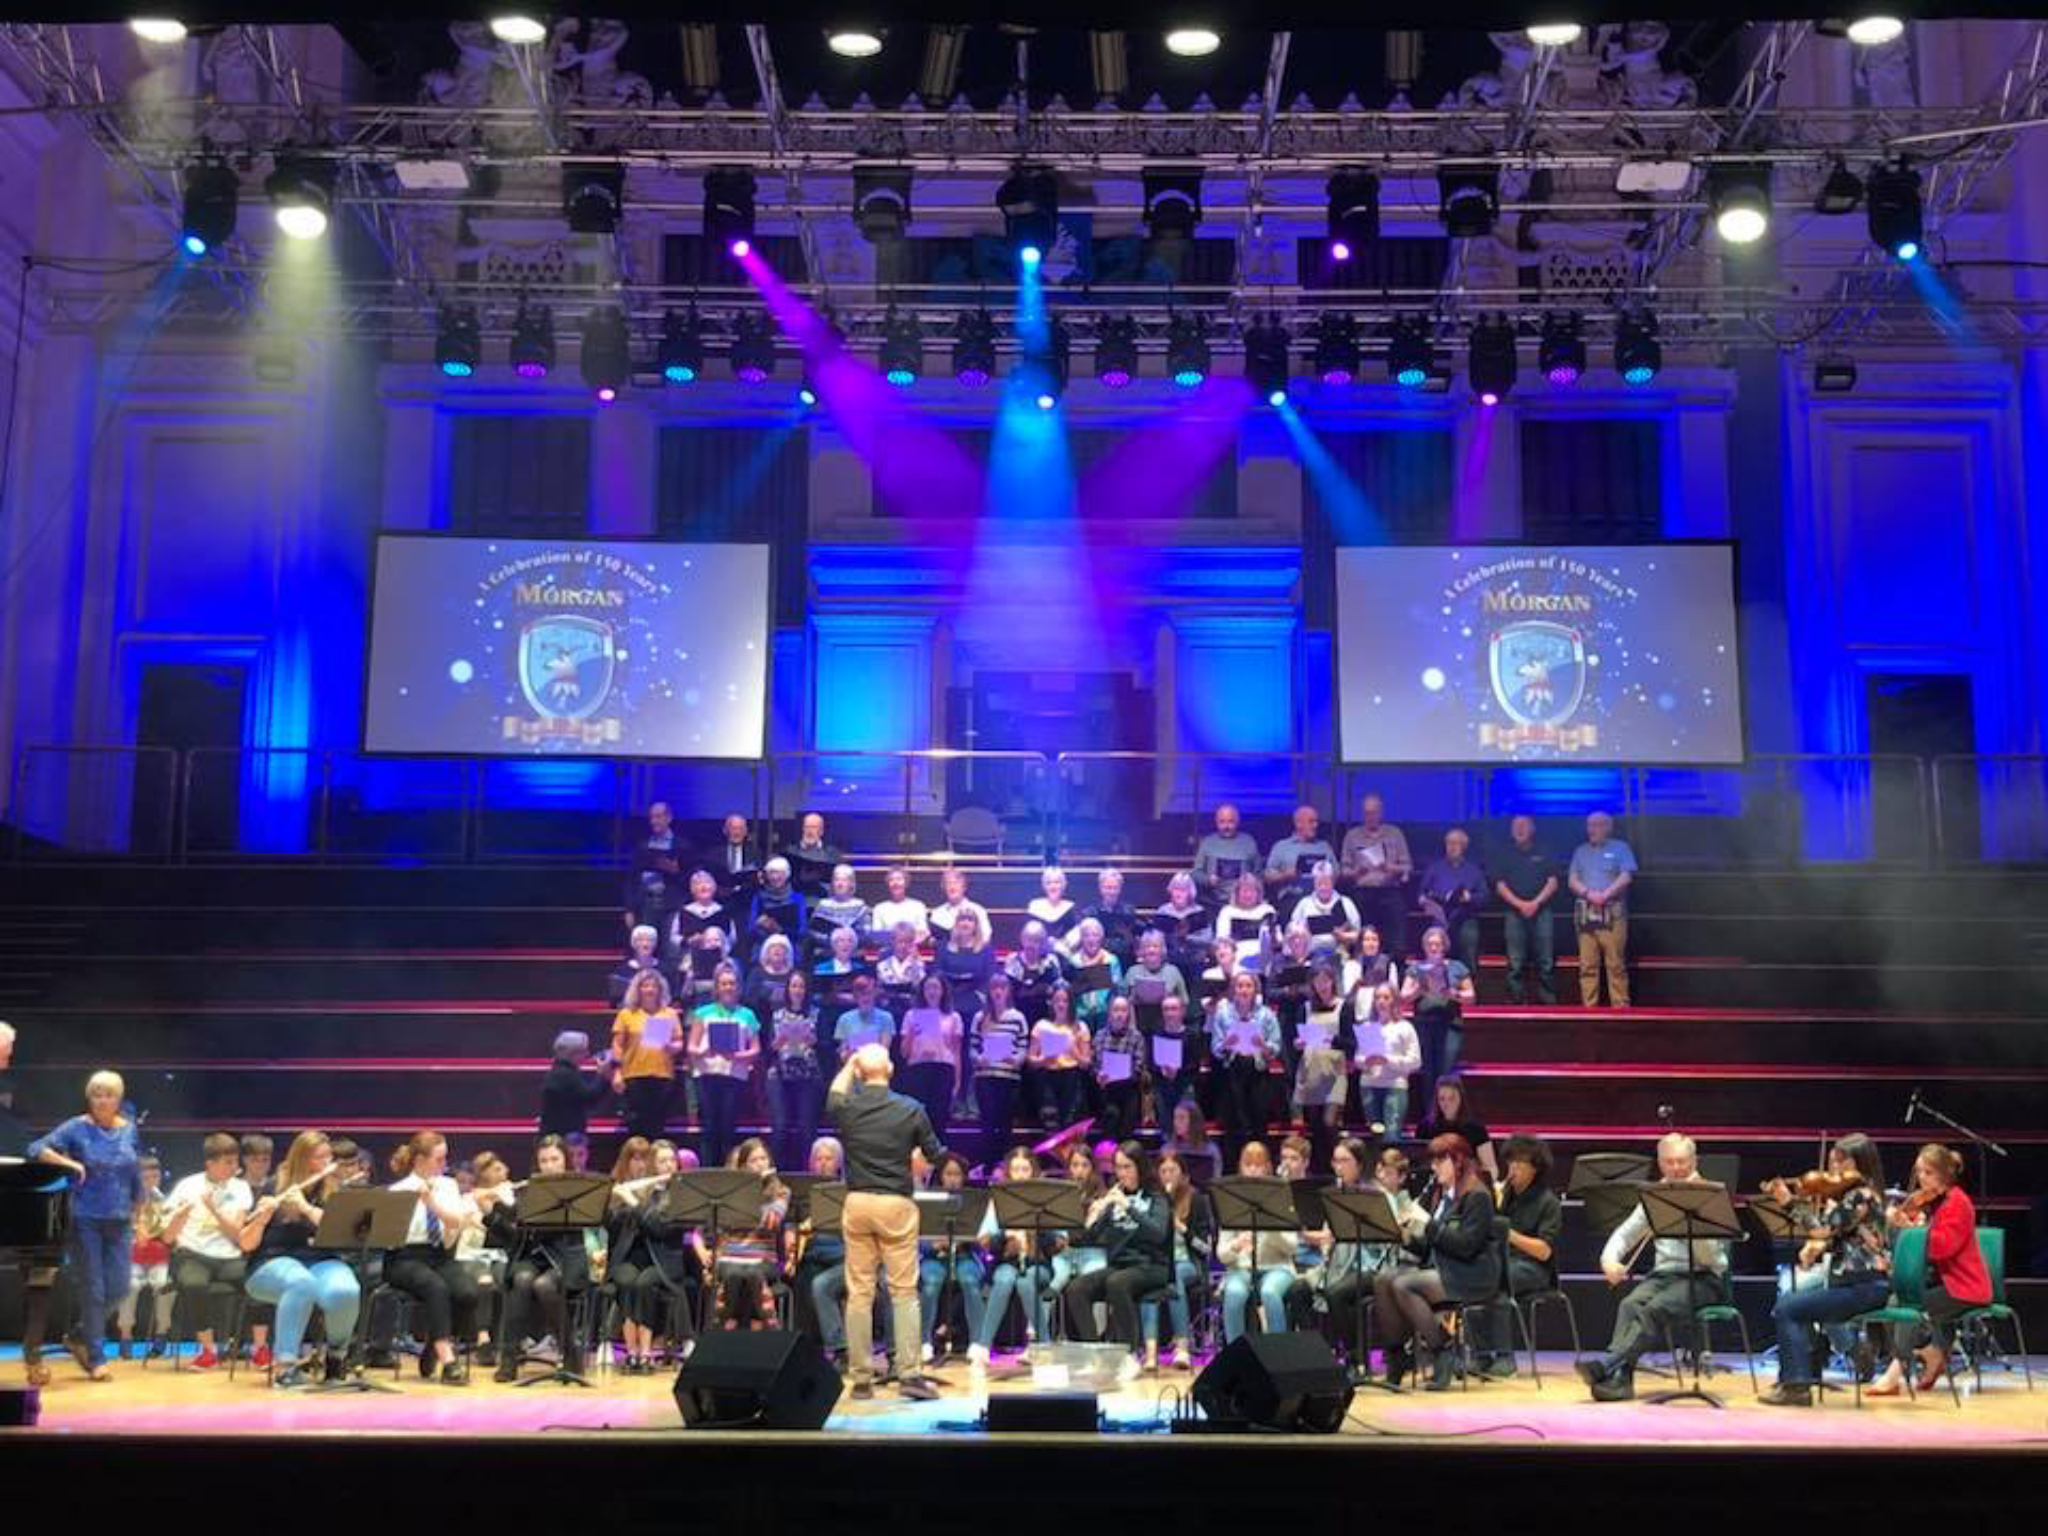 Dundee Caird Hall Concert